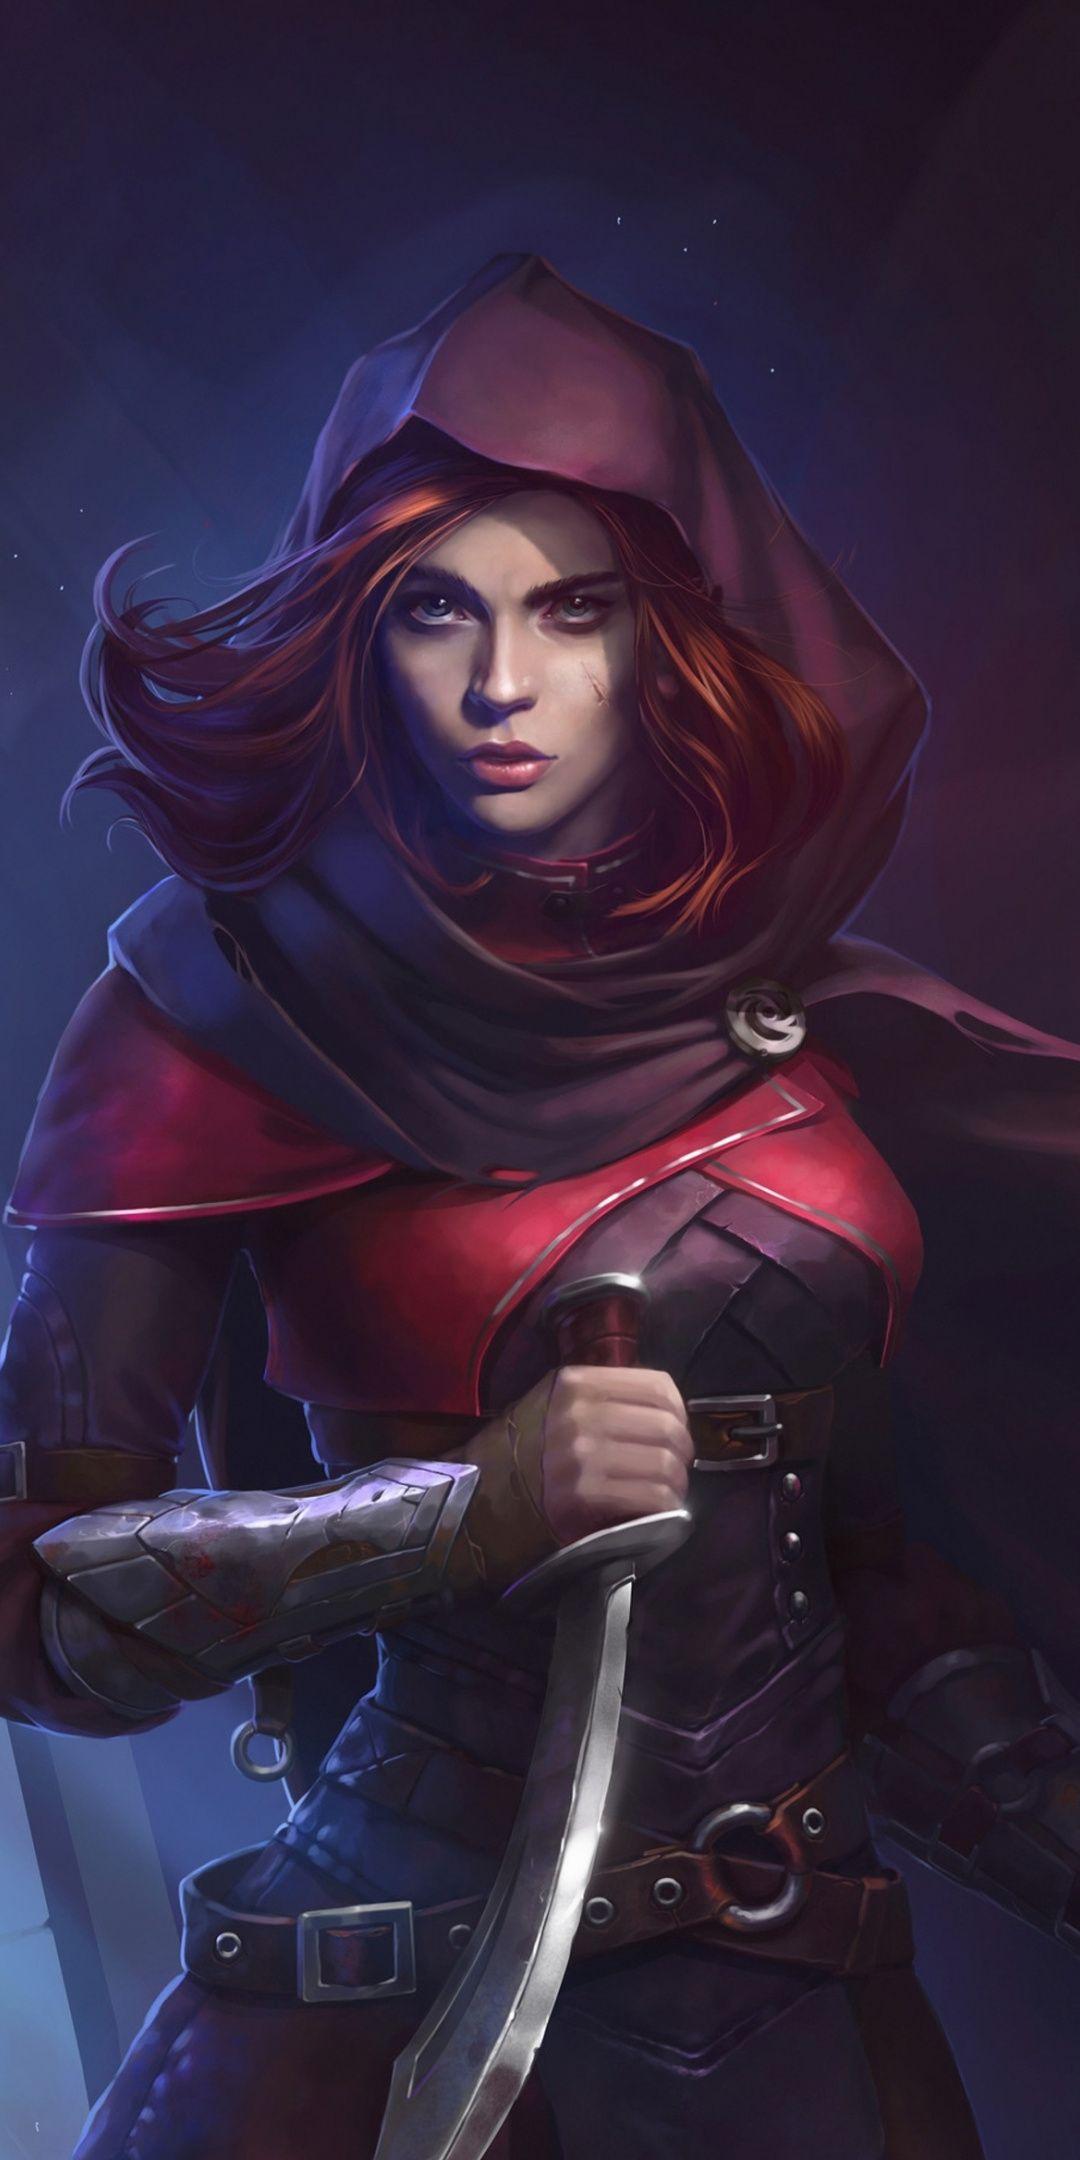 Woman Assassin Beautiful Red Head Illustration 1080x2160 Wallpaper Fantasy Art Women Female Assassin Fantasy Girl